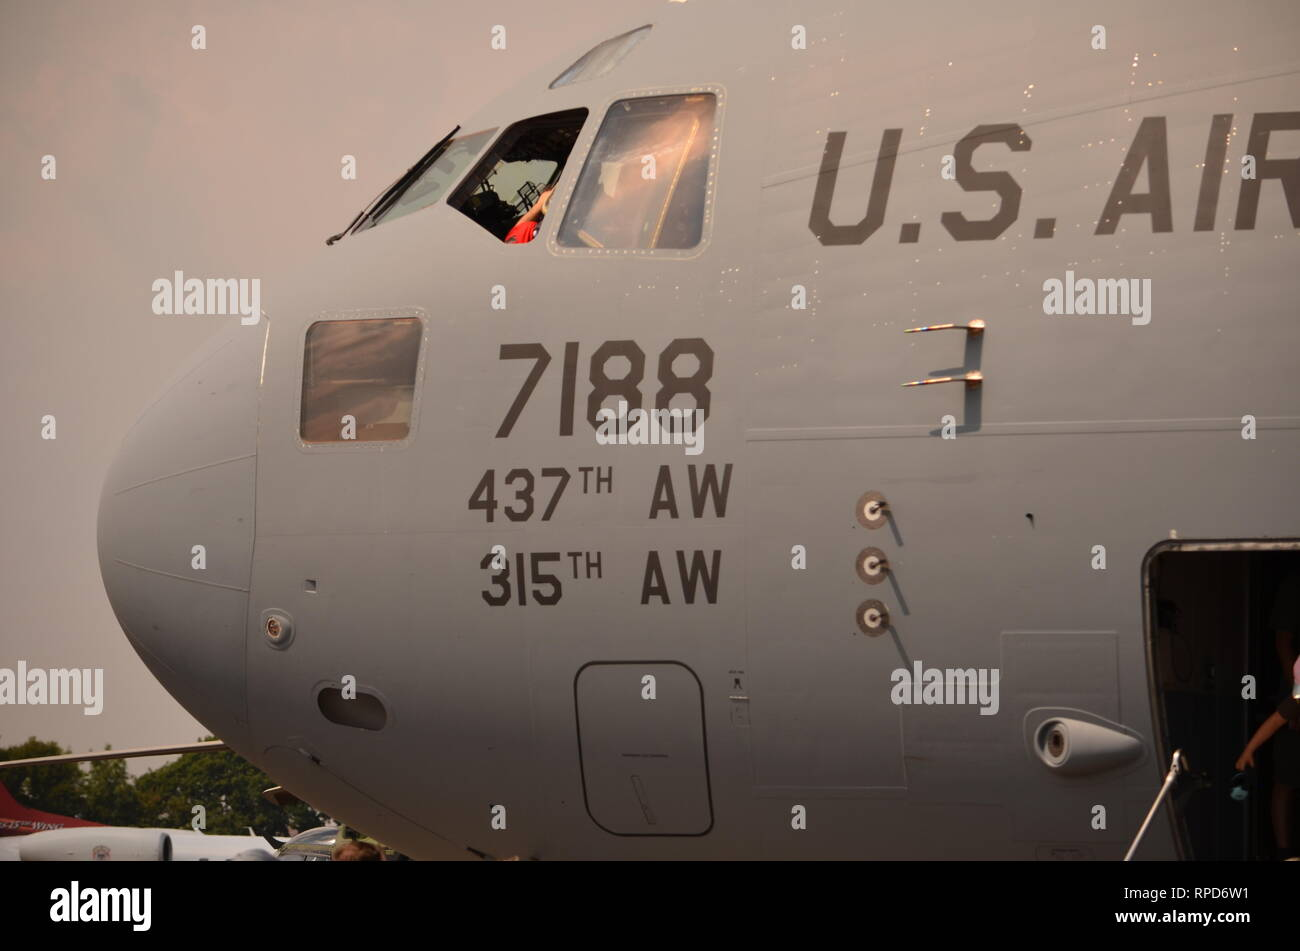 Boeing C-17 Globemaster,  military transport aircraft. - Stock Image